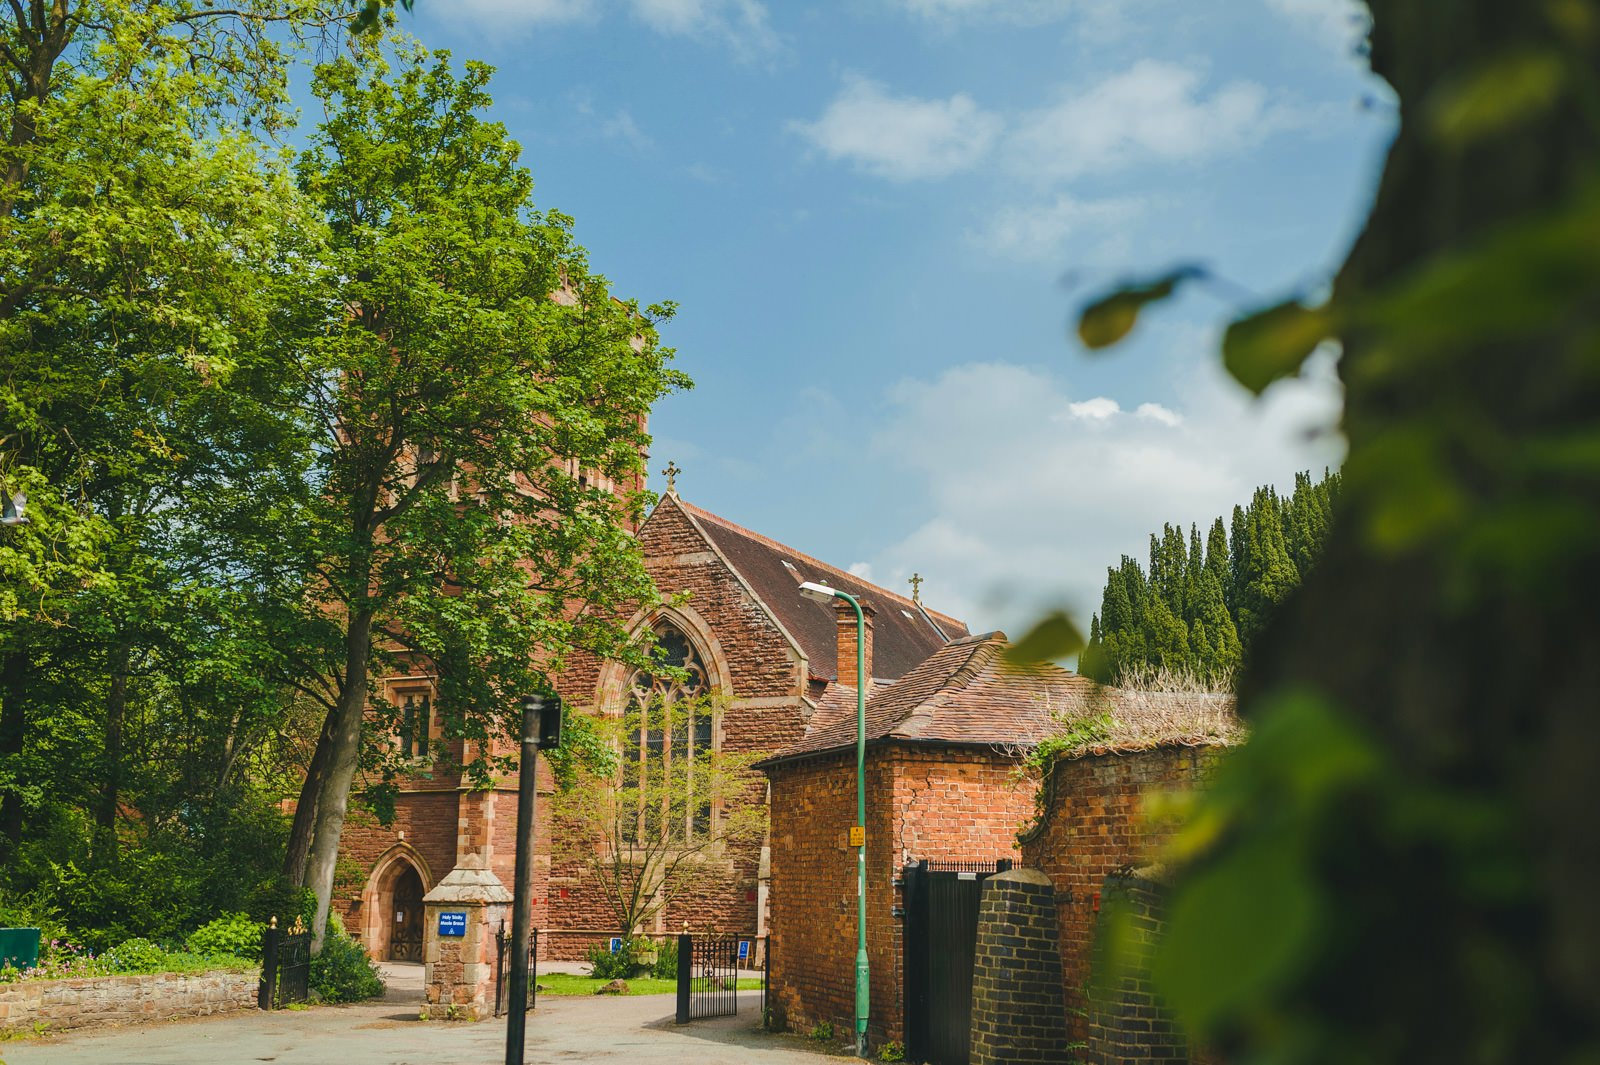 Millers Of Netley wedding, Dorrington, Shrewsbury | Emma + Ben 10